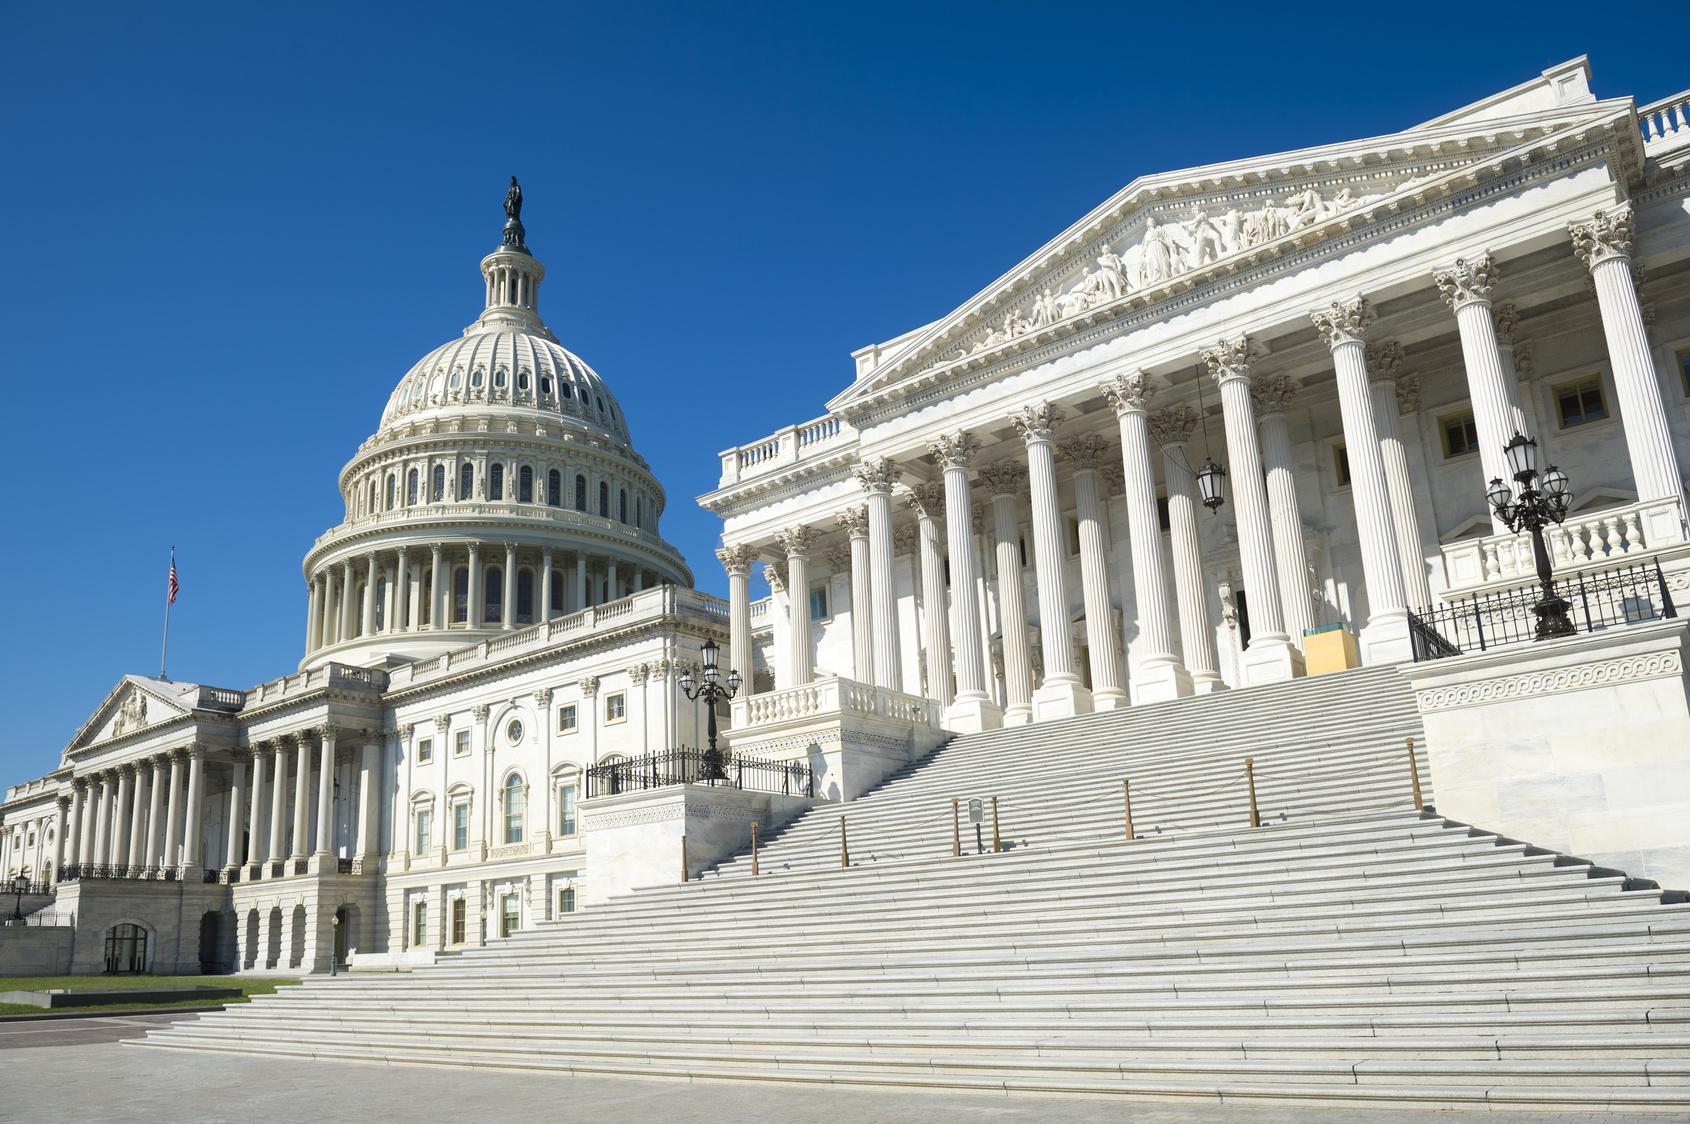 Senate/Congress